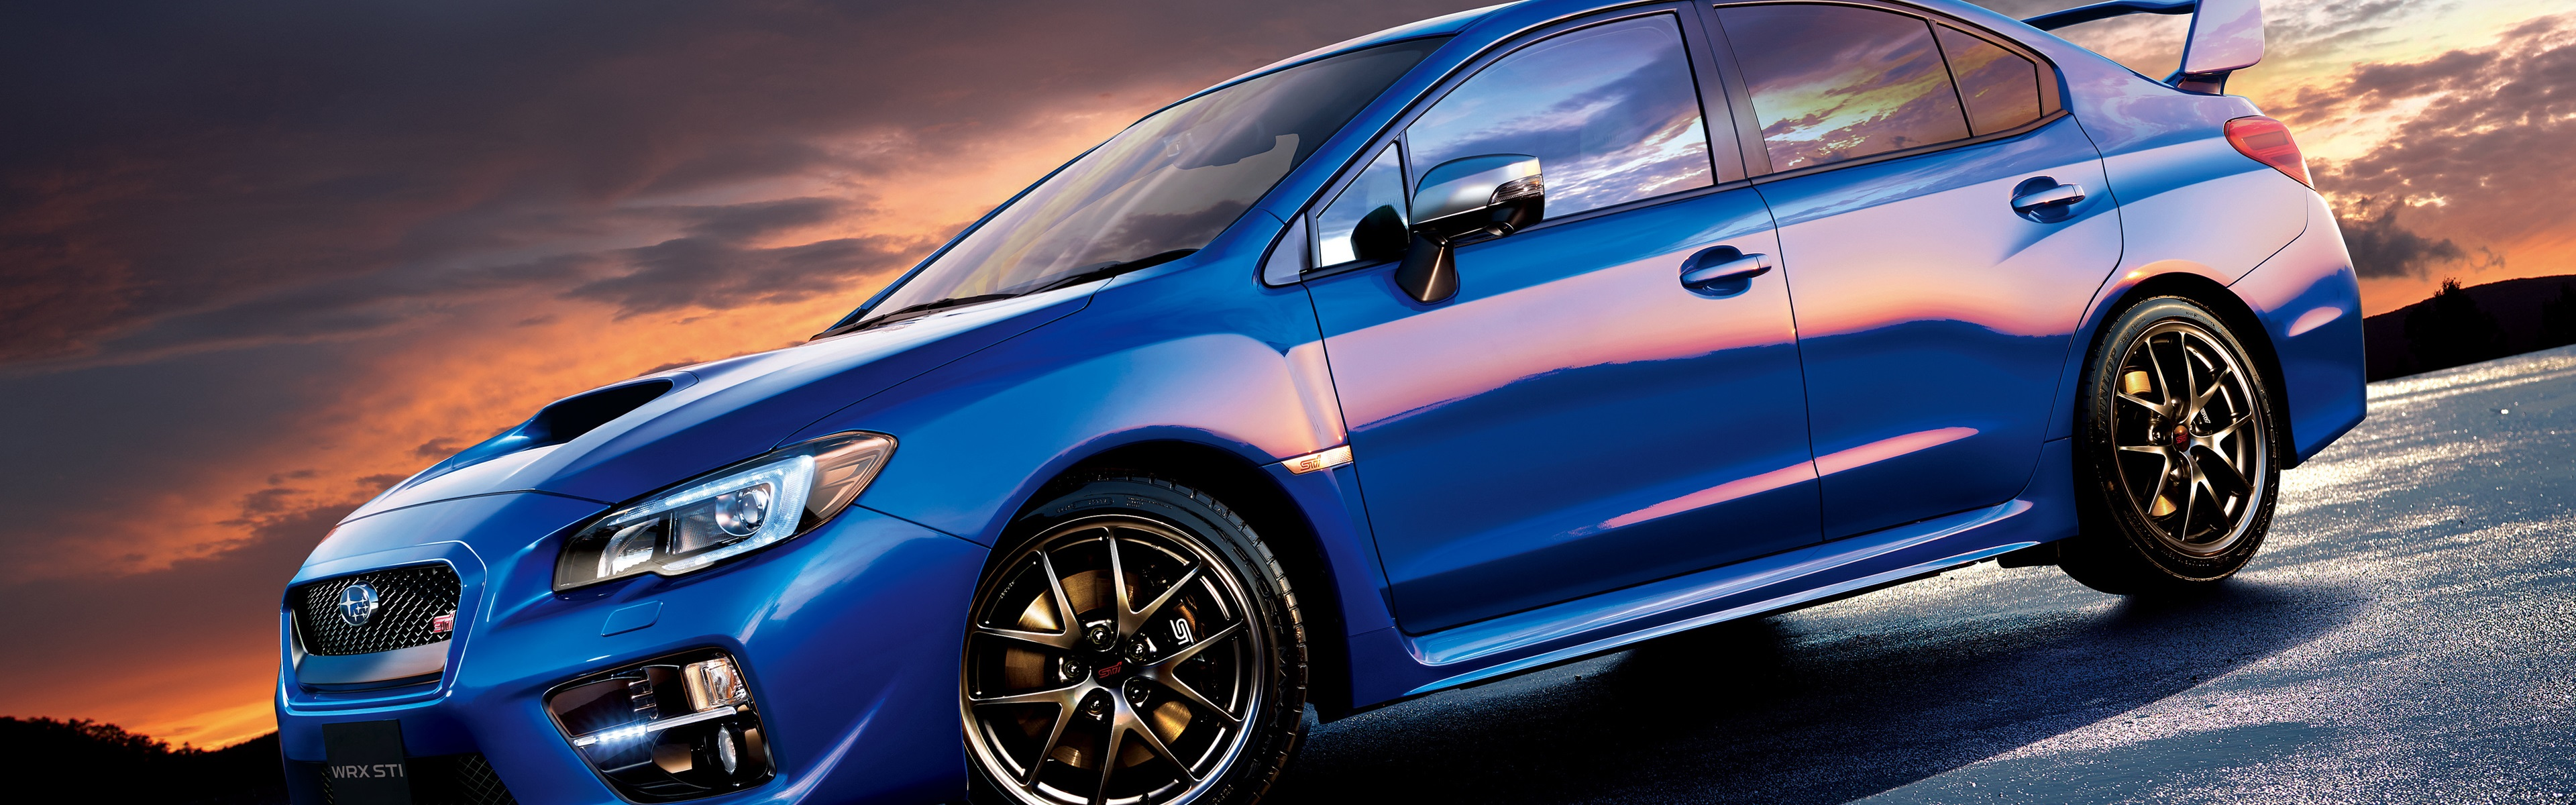 Wallpaper Subaru STI WRX blue car side view 3840x2160 UHD 4K